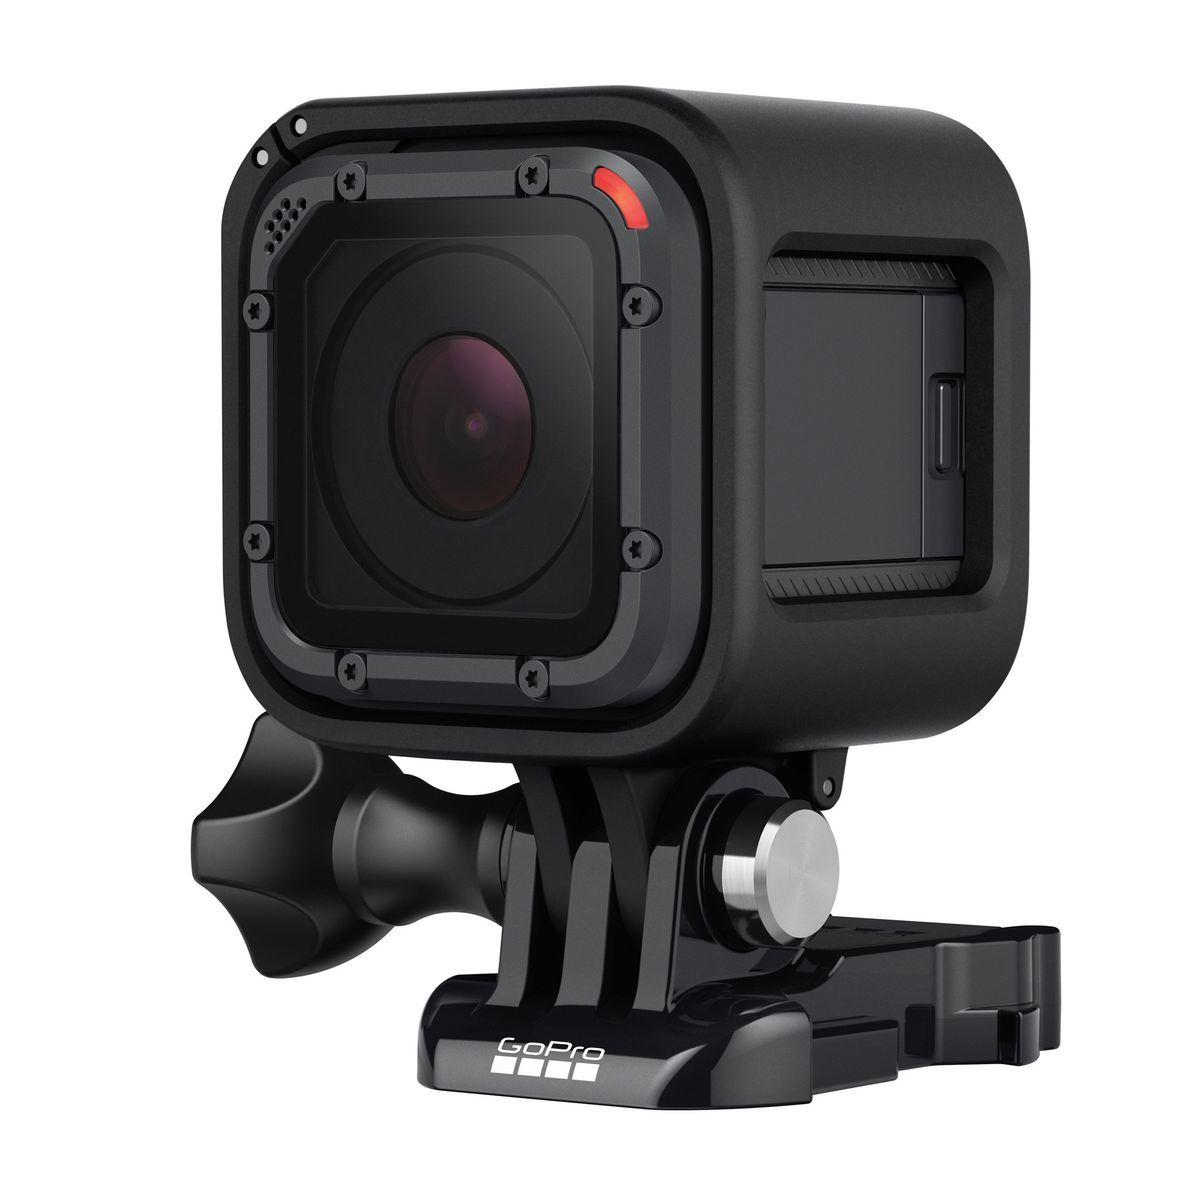 Gopro Hero5 Session Camera Black My Surfdome Christmas Wishlist Free Acc Seeker